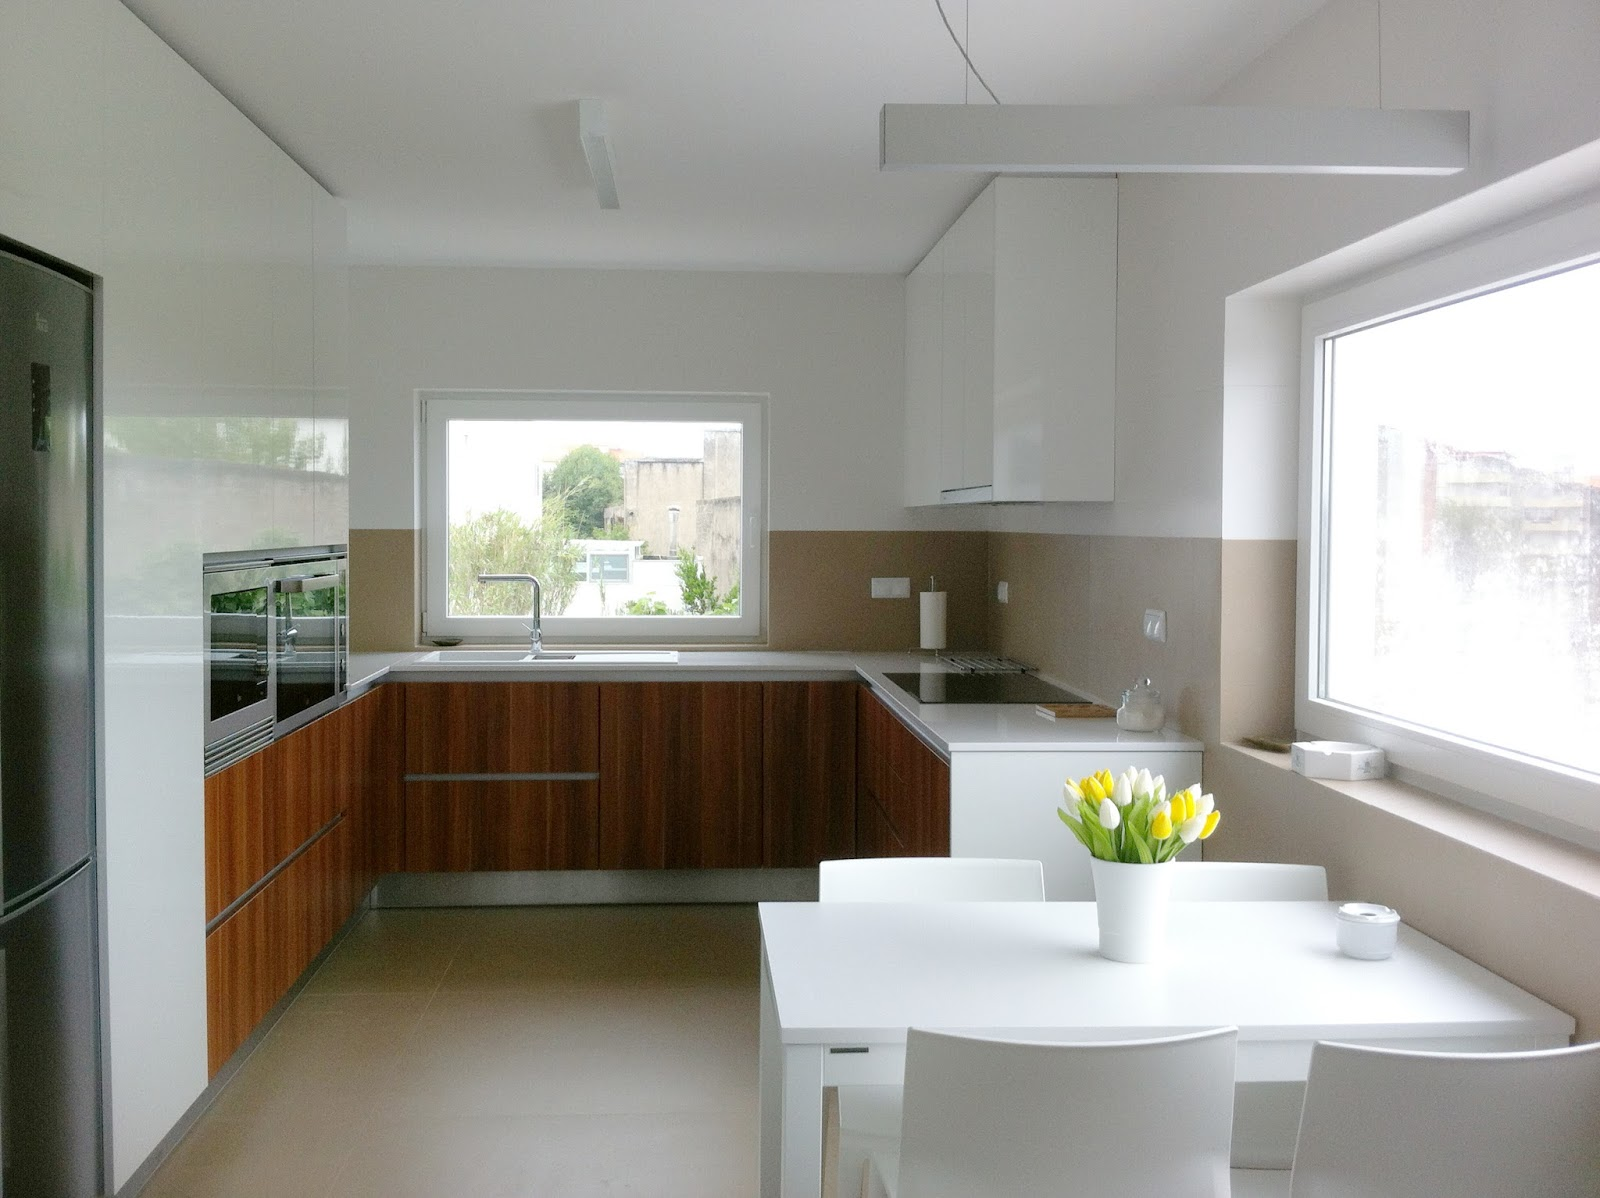 remodelação de cozinha 1 remodelação de cozinha 2 antes e #623E1F 1600 1198